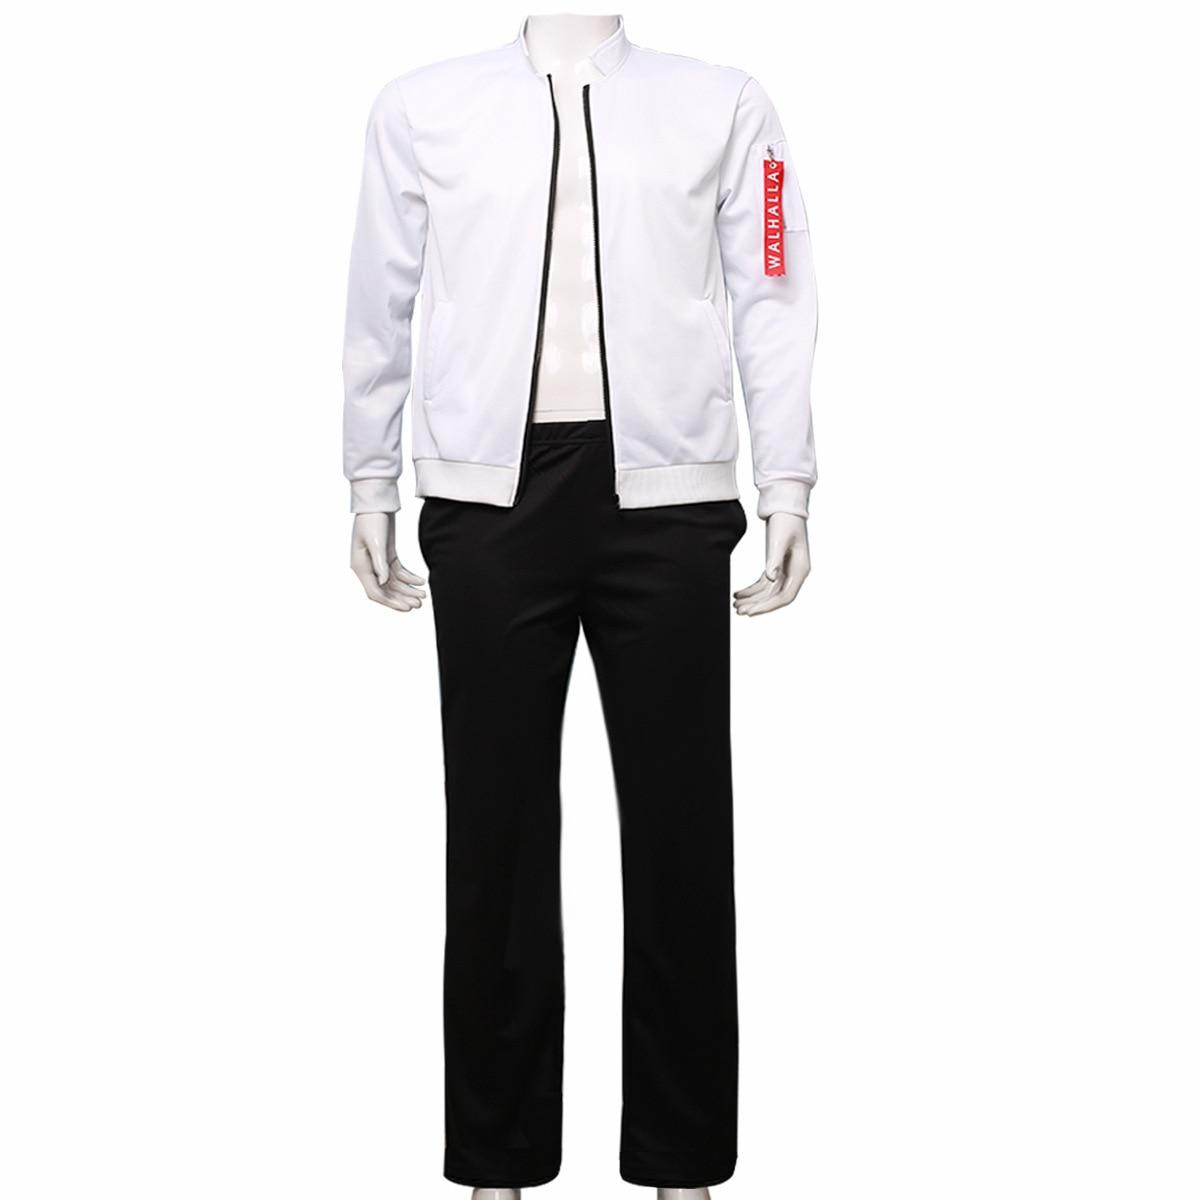 Anime Tokyo Revengers Hanemiya Kazutora Cosplay Costume White Jacket Pants Valhalla Uniform Baseball Coat Halloween Clothes